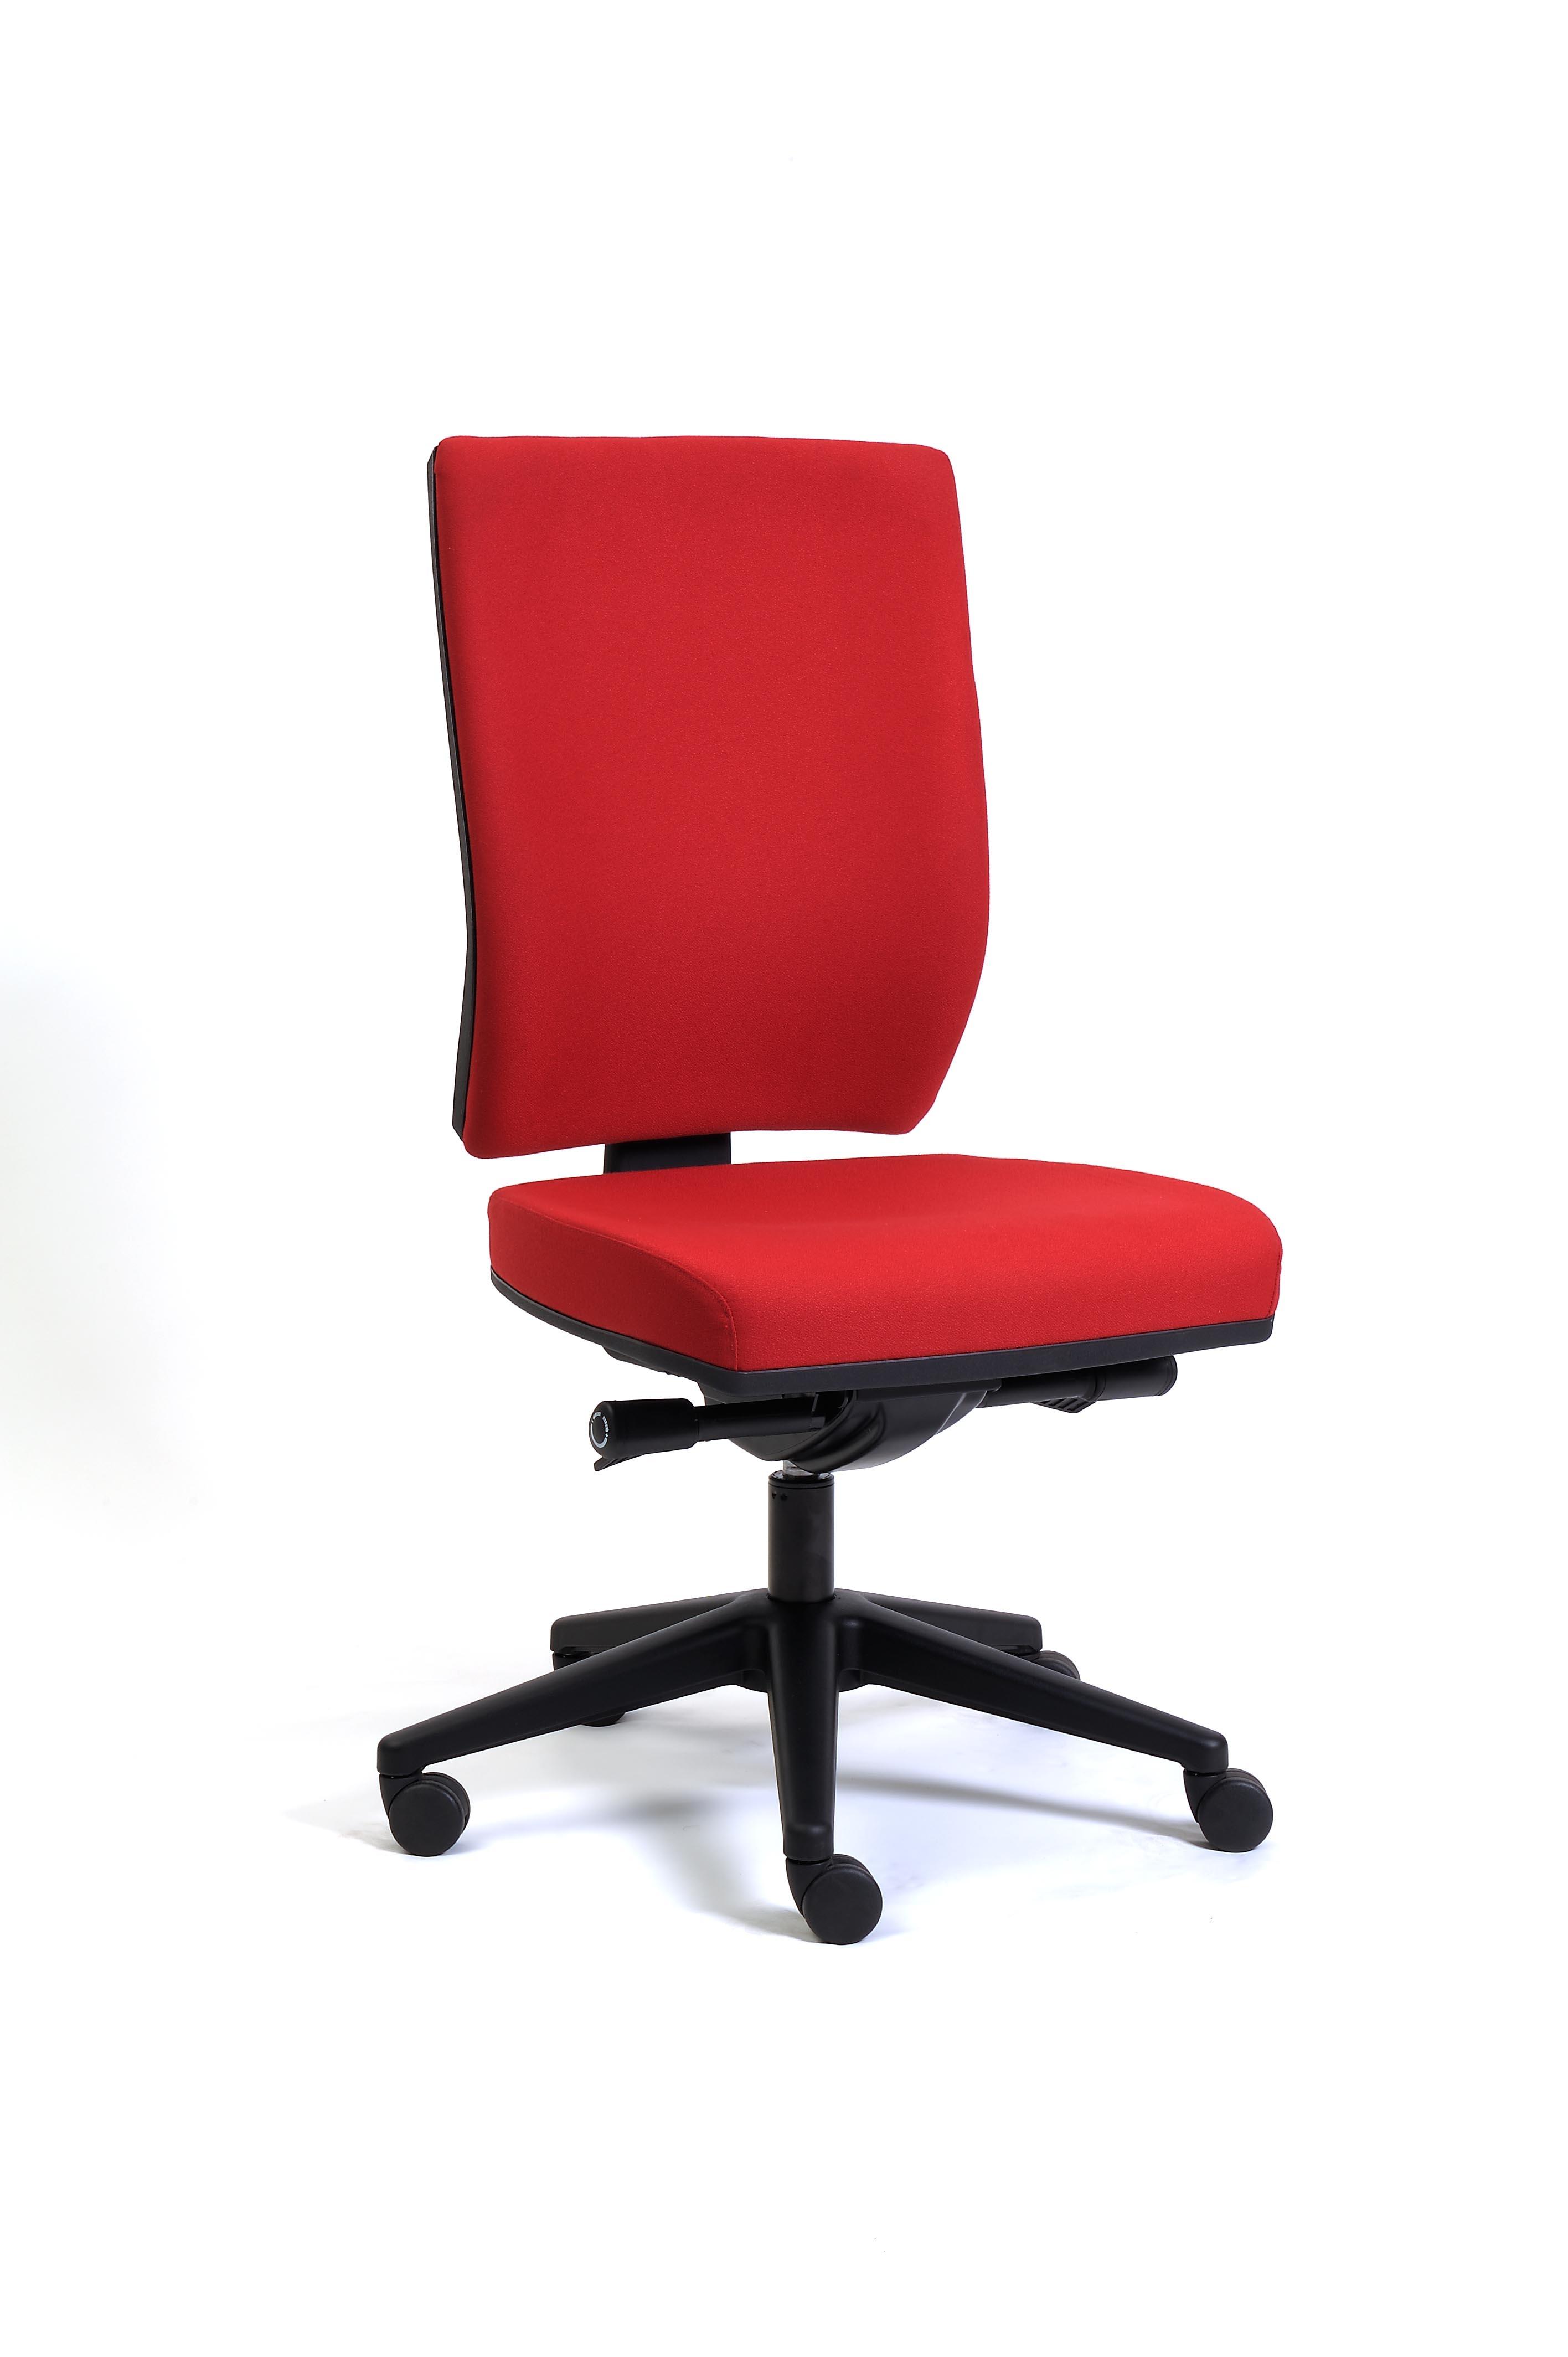 Renaissance High Back Typist Chair